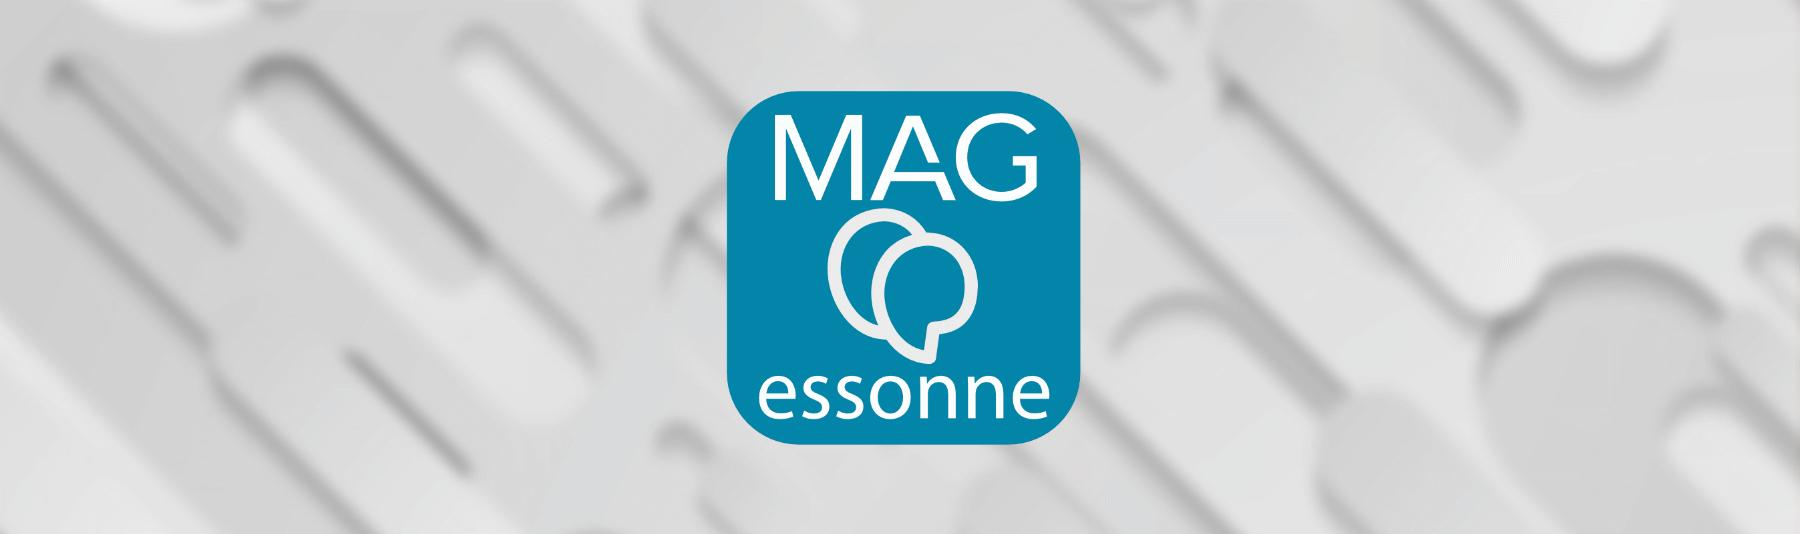 Le Mag Essonne